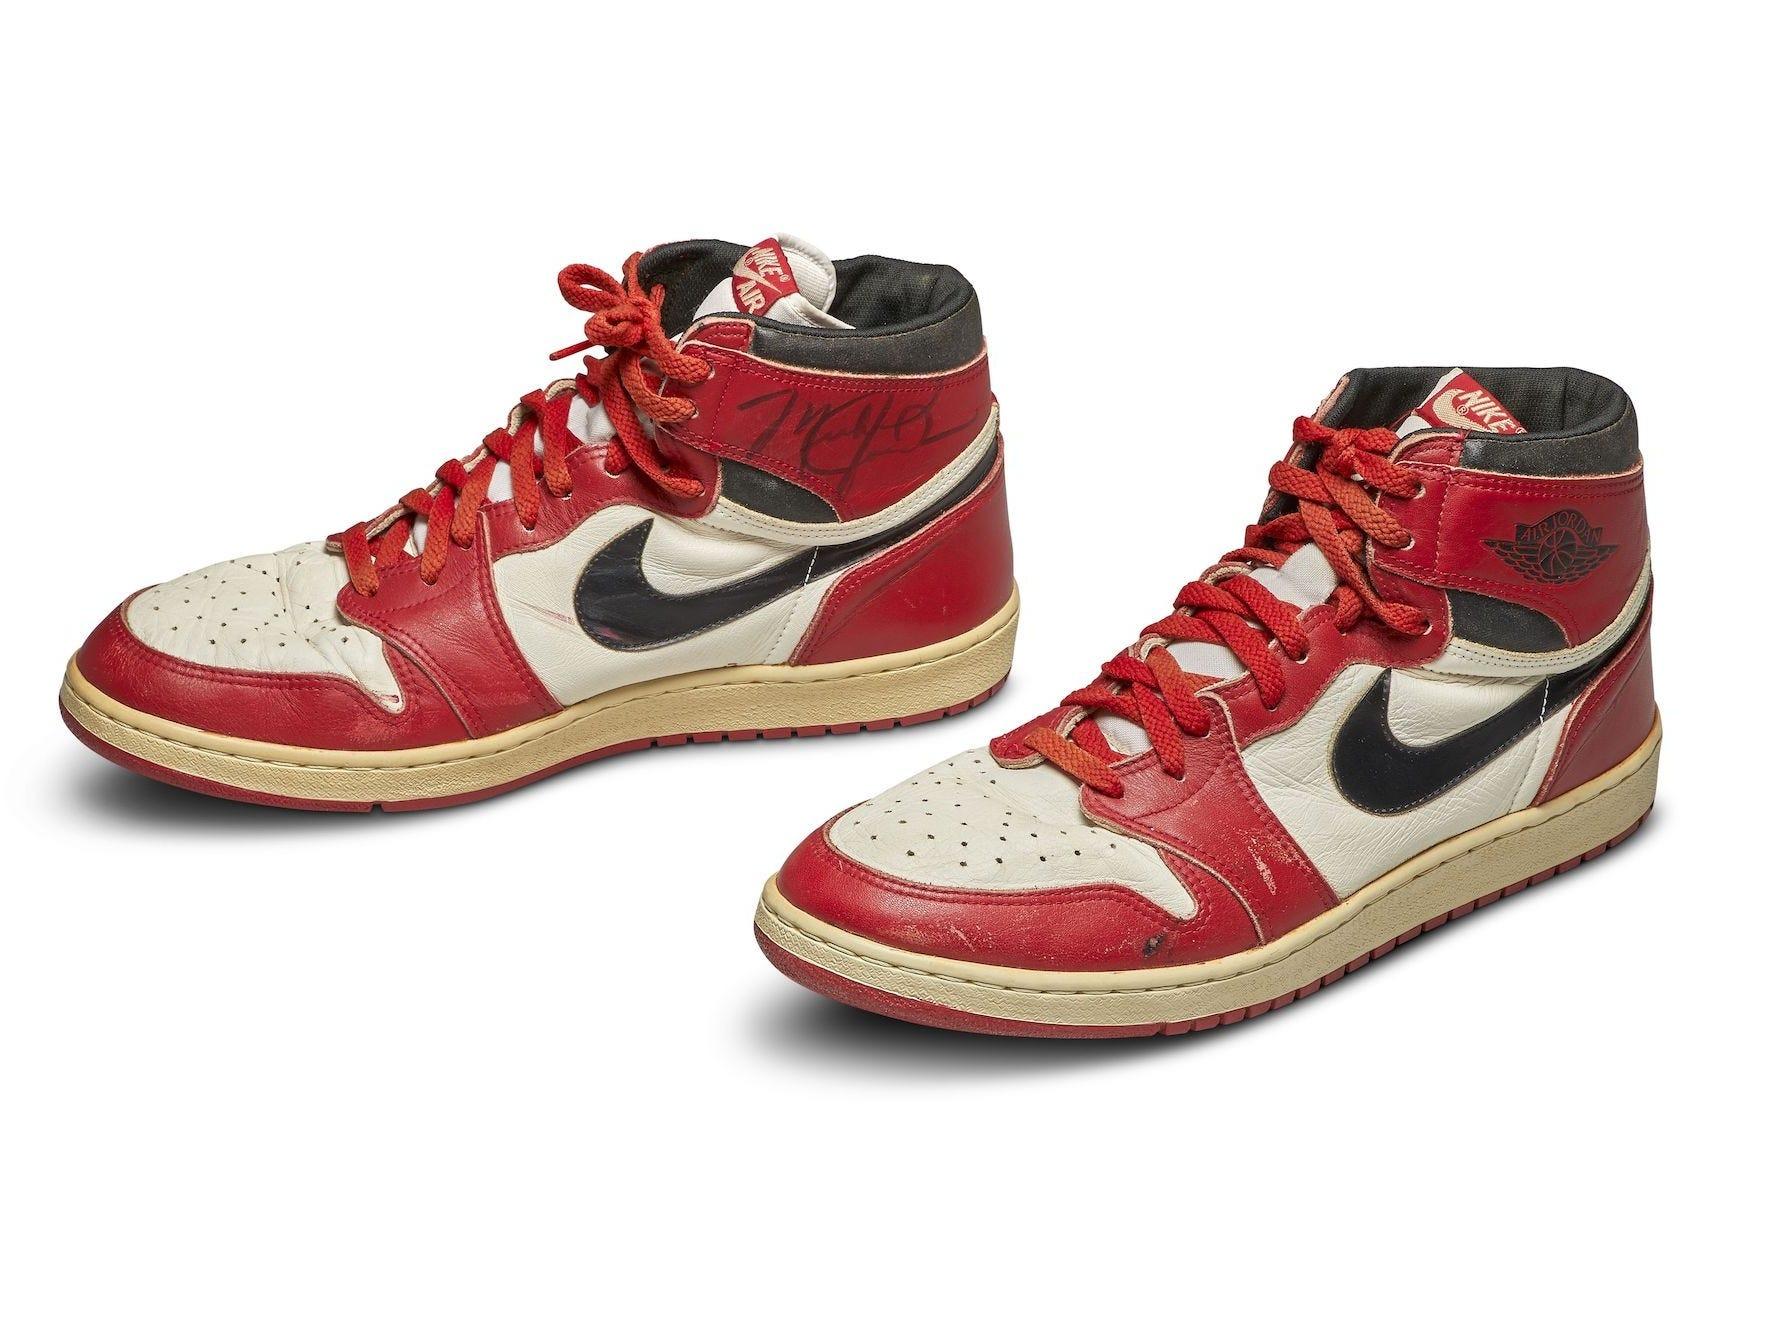 autographed 1985 Nike Air Jordan 1s